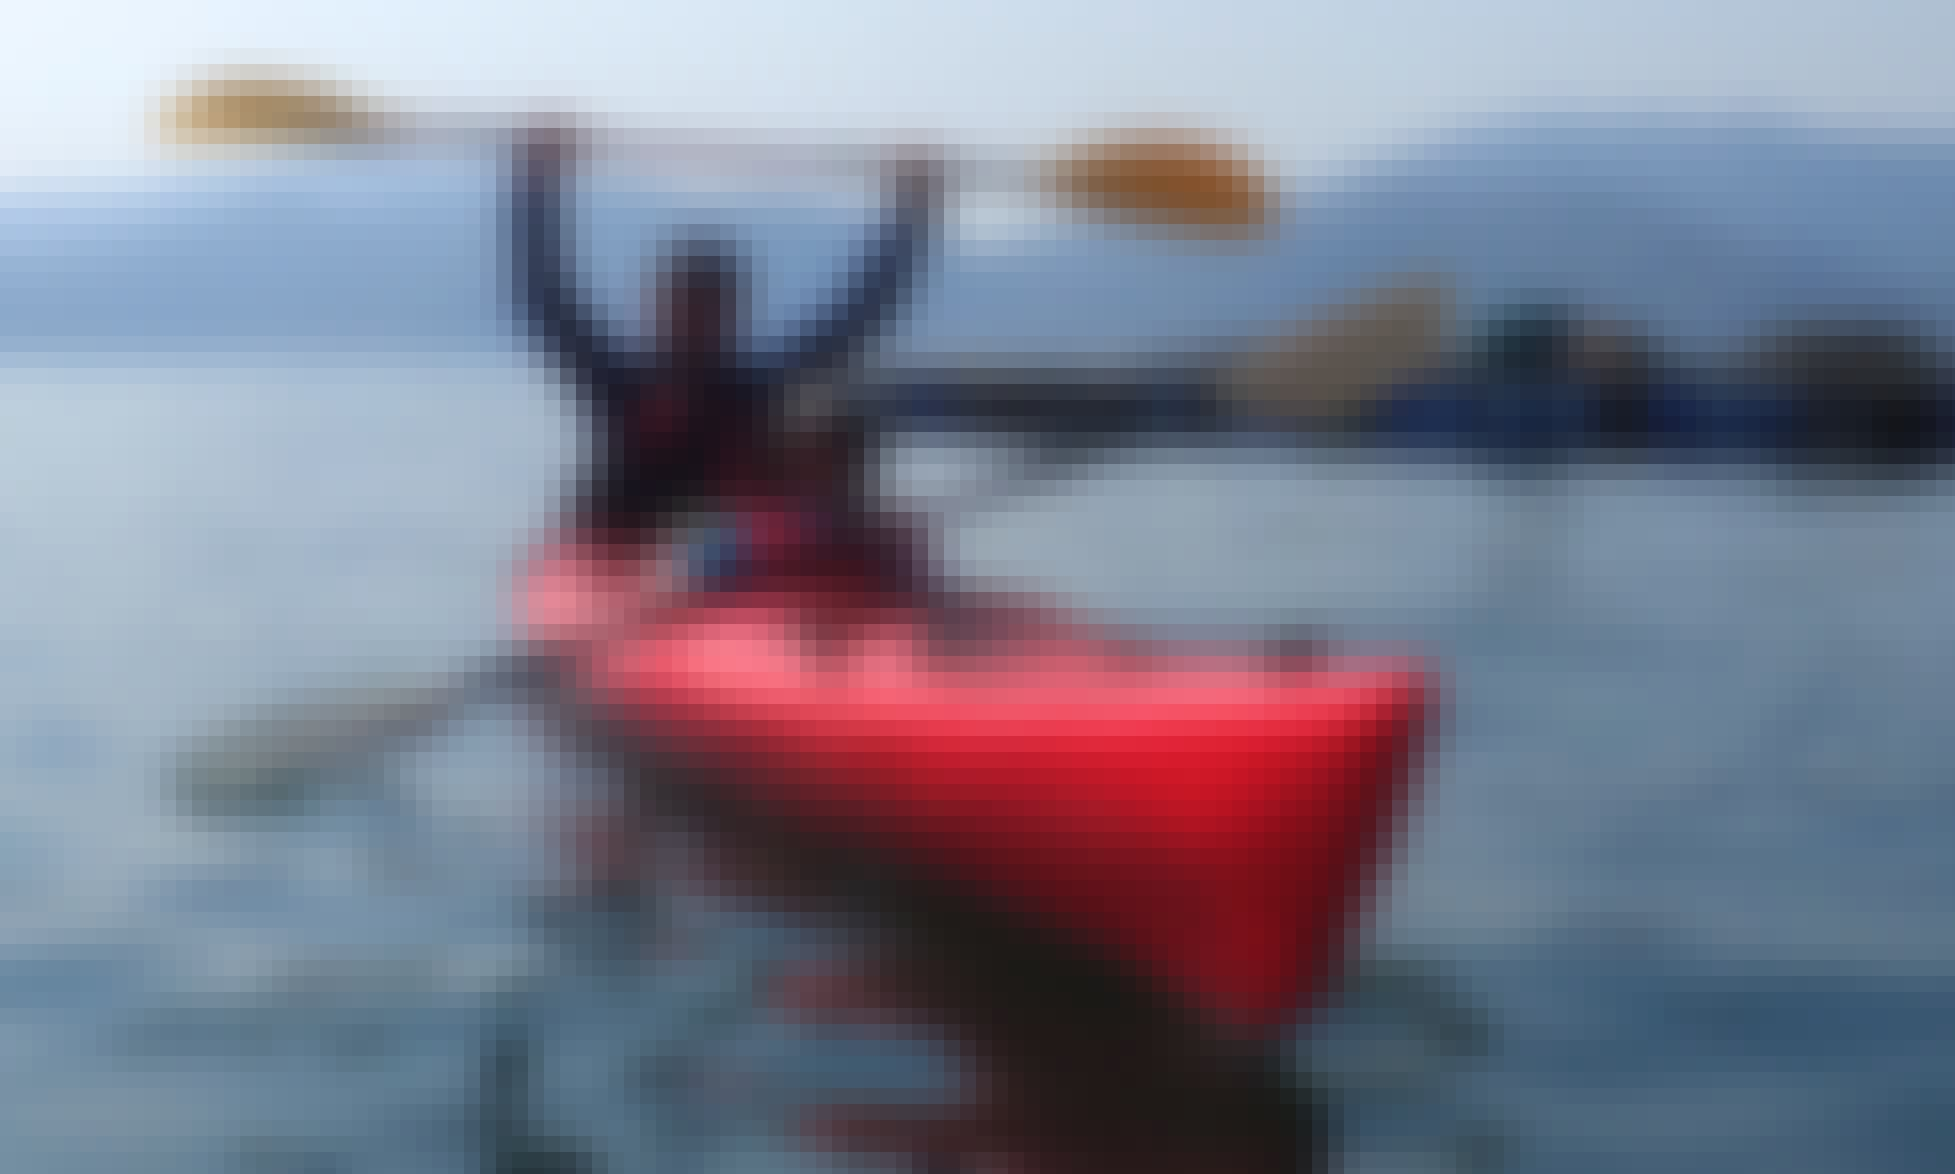 1-Day Sea Kayak Tour to Tai O and Sai Wan Geo Park in Hong Kong